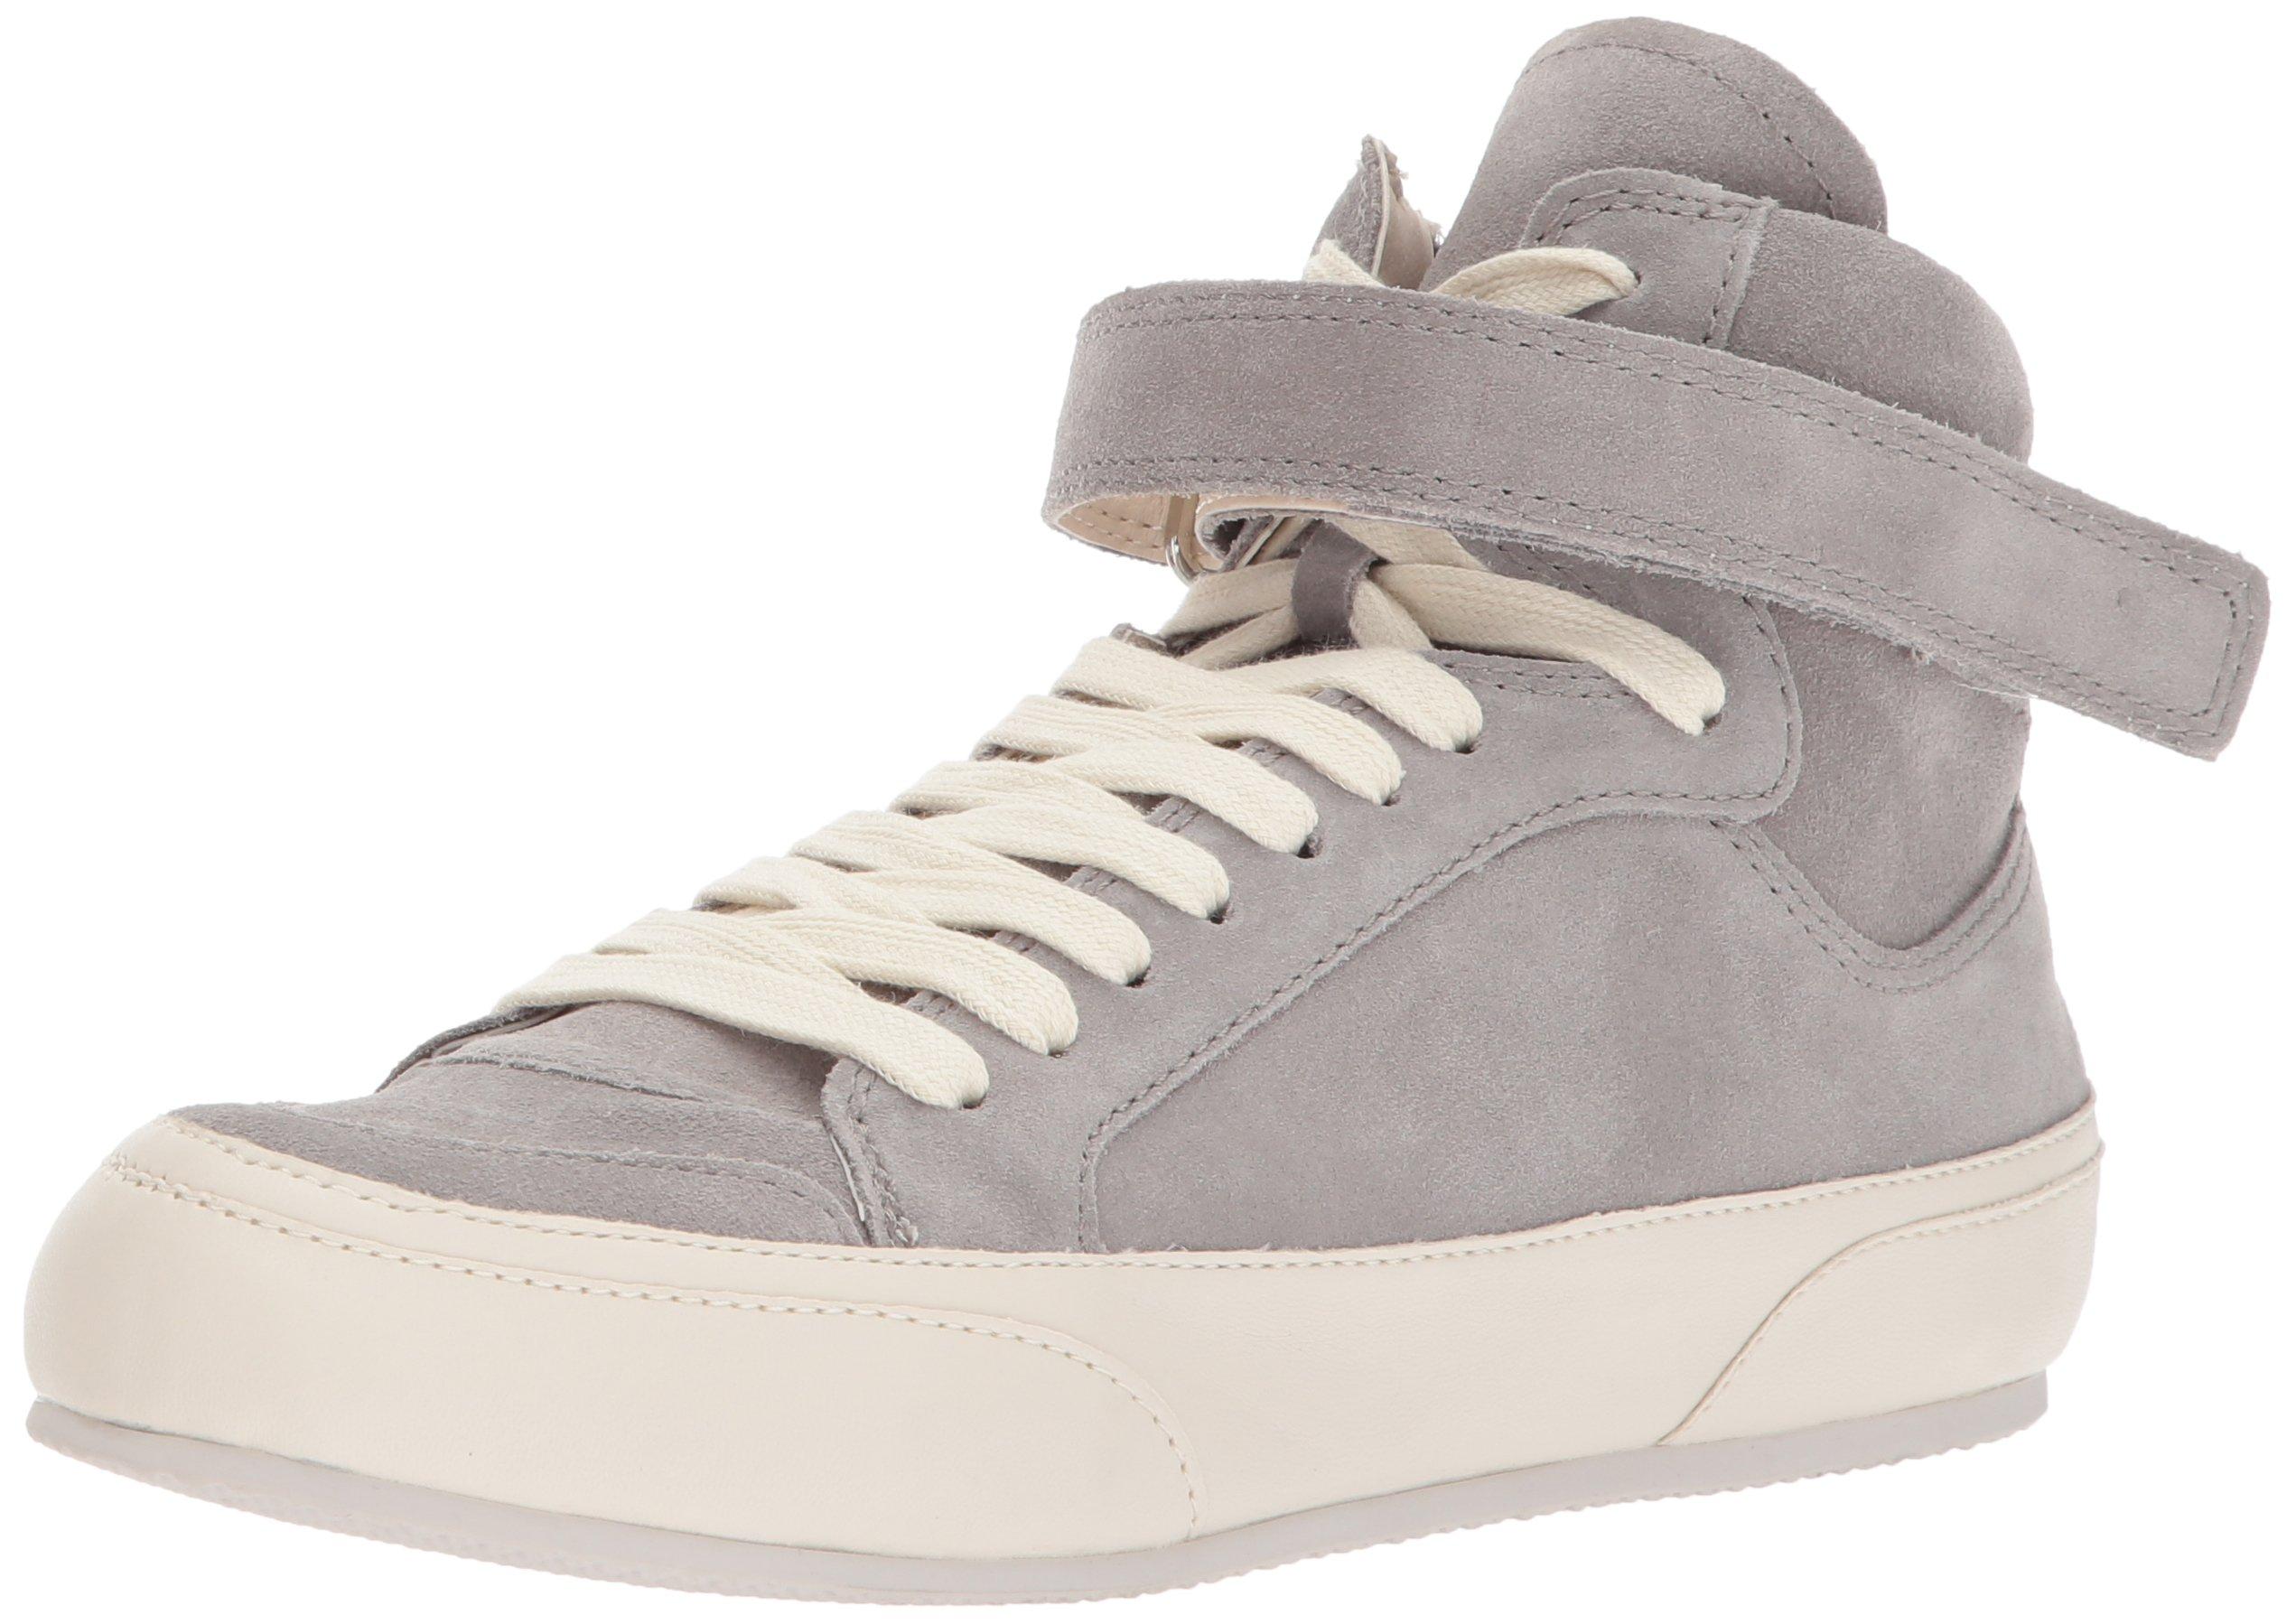 Dolce Vita Women's Westly Sneaker, Grey Suede, 8.5 Medium US